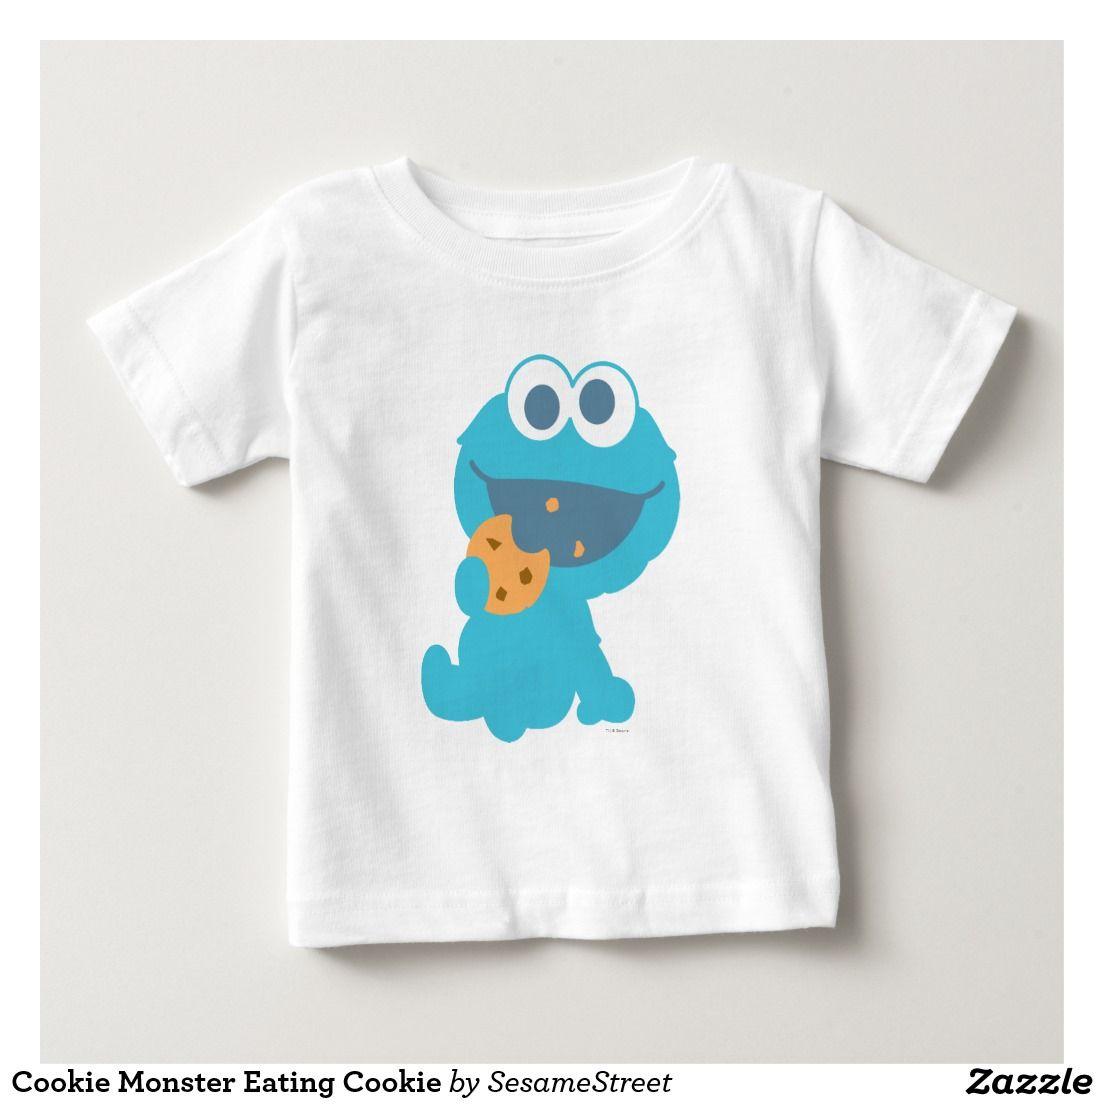 Cookie Monster Eating Cookie Baby T